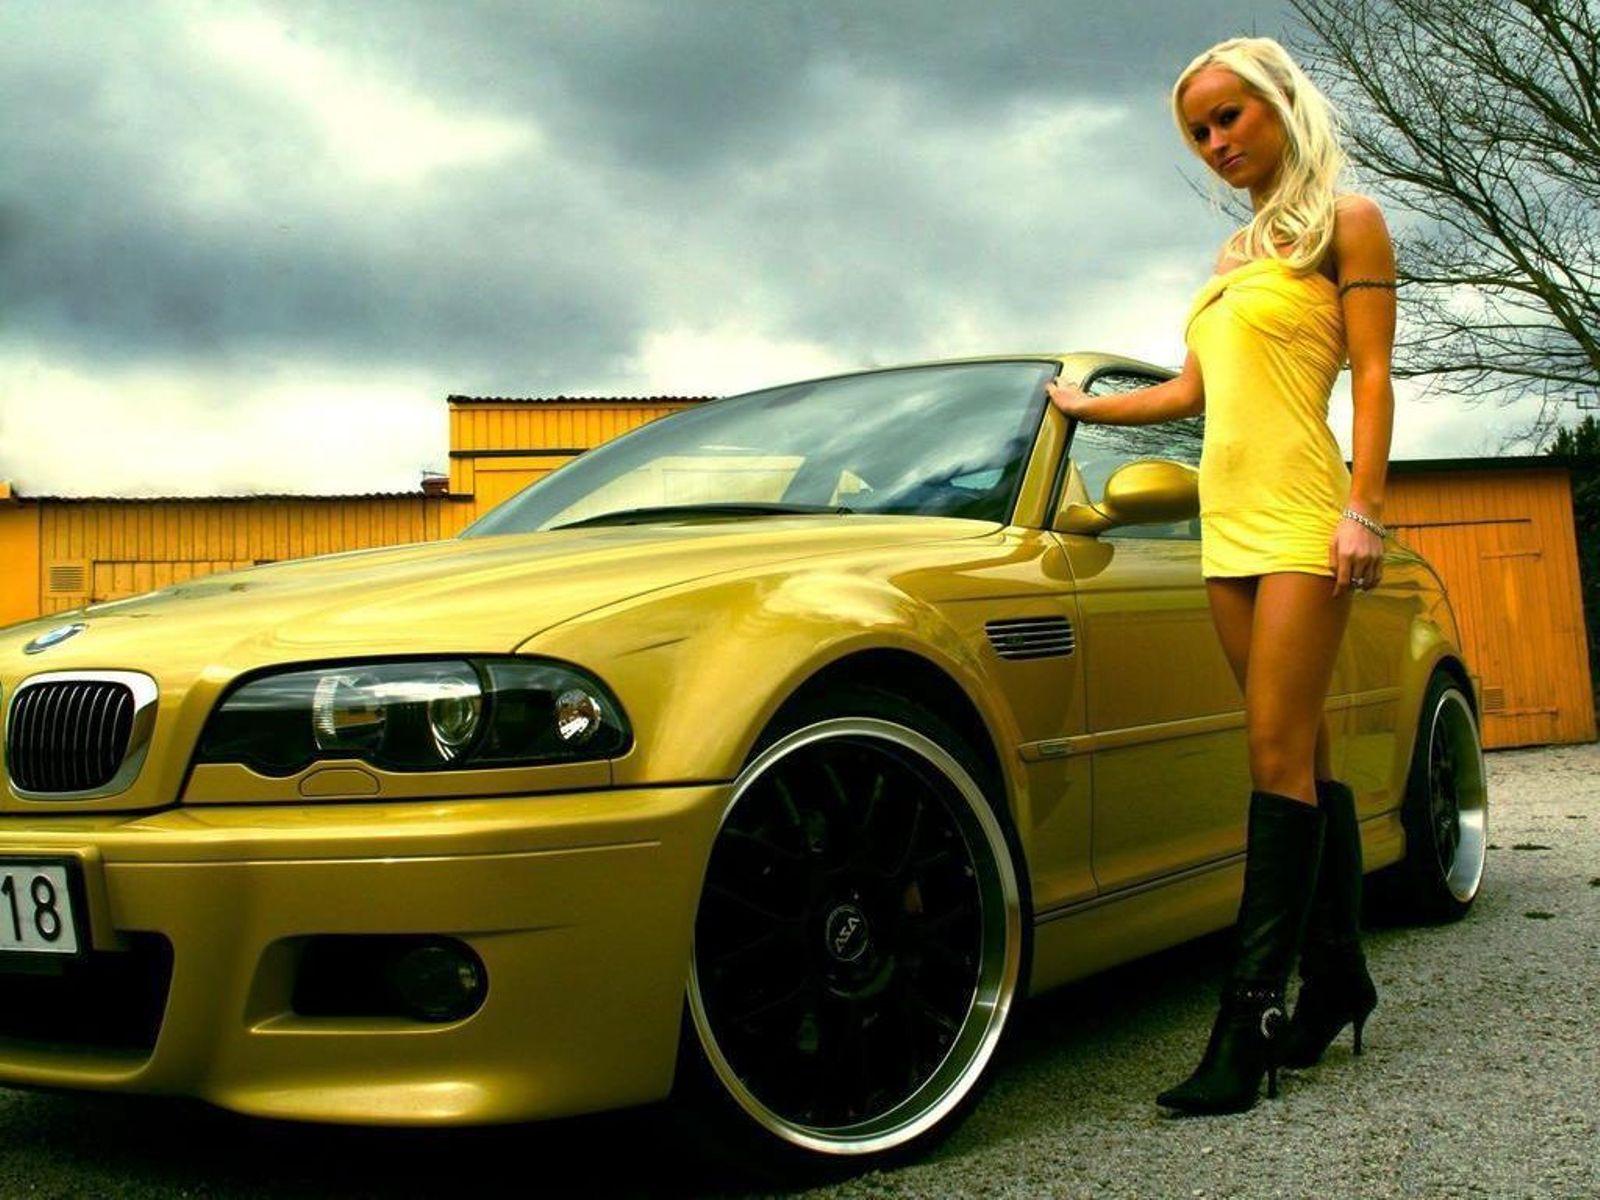 Желтое платье девушки фото